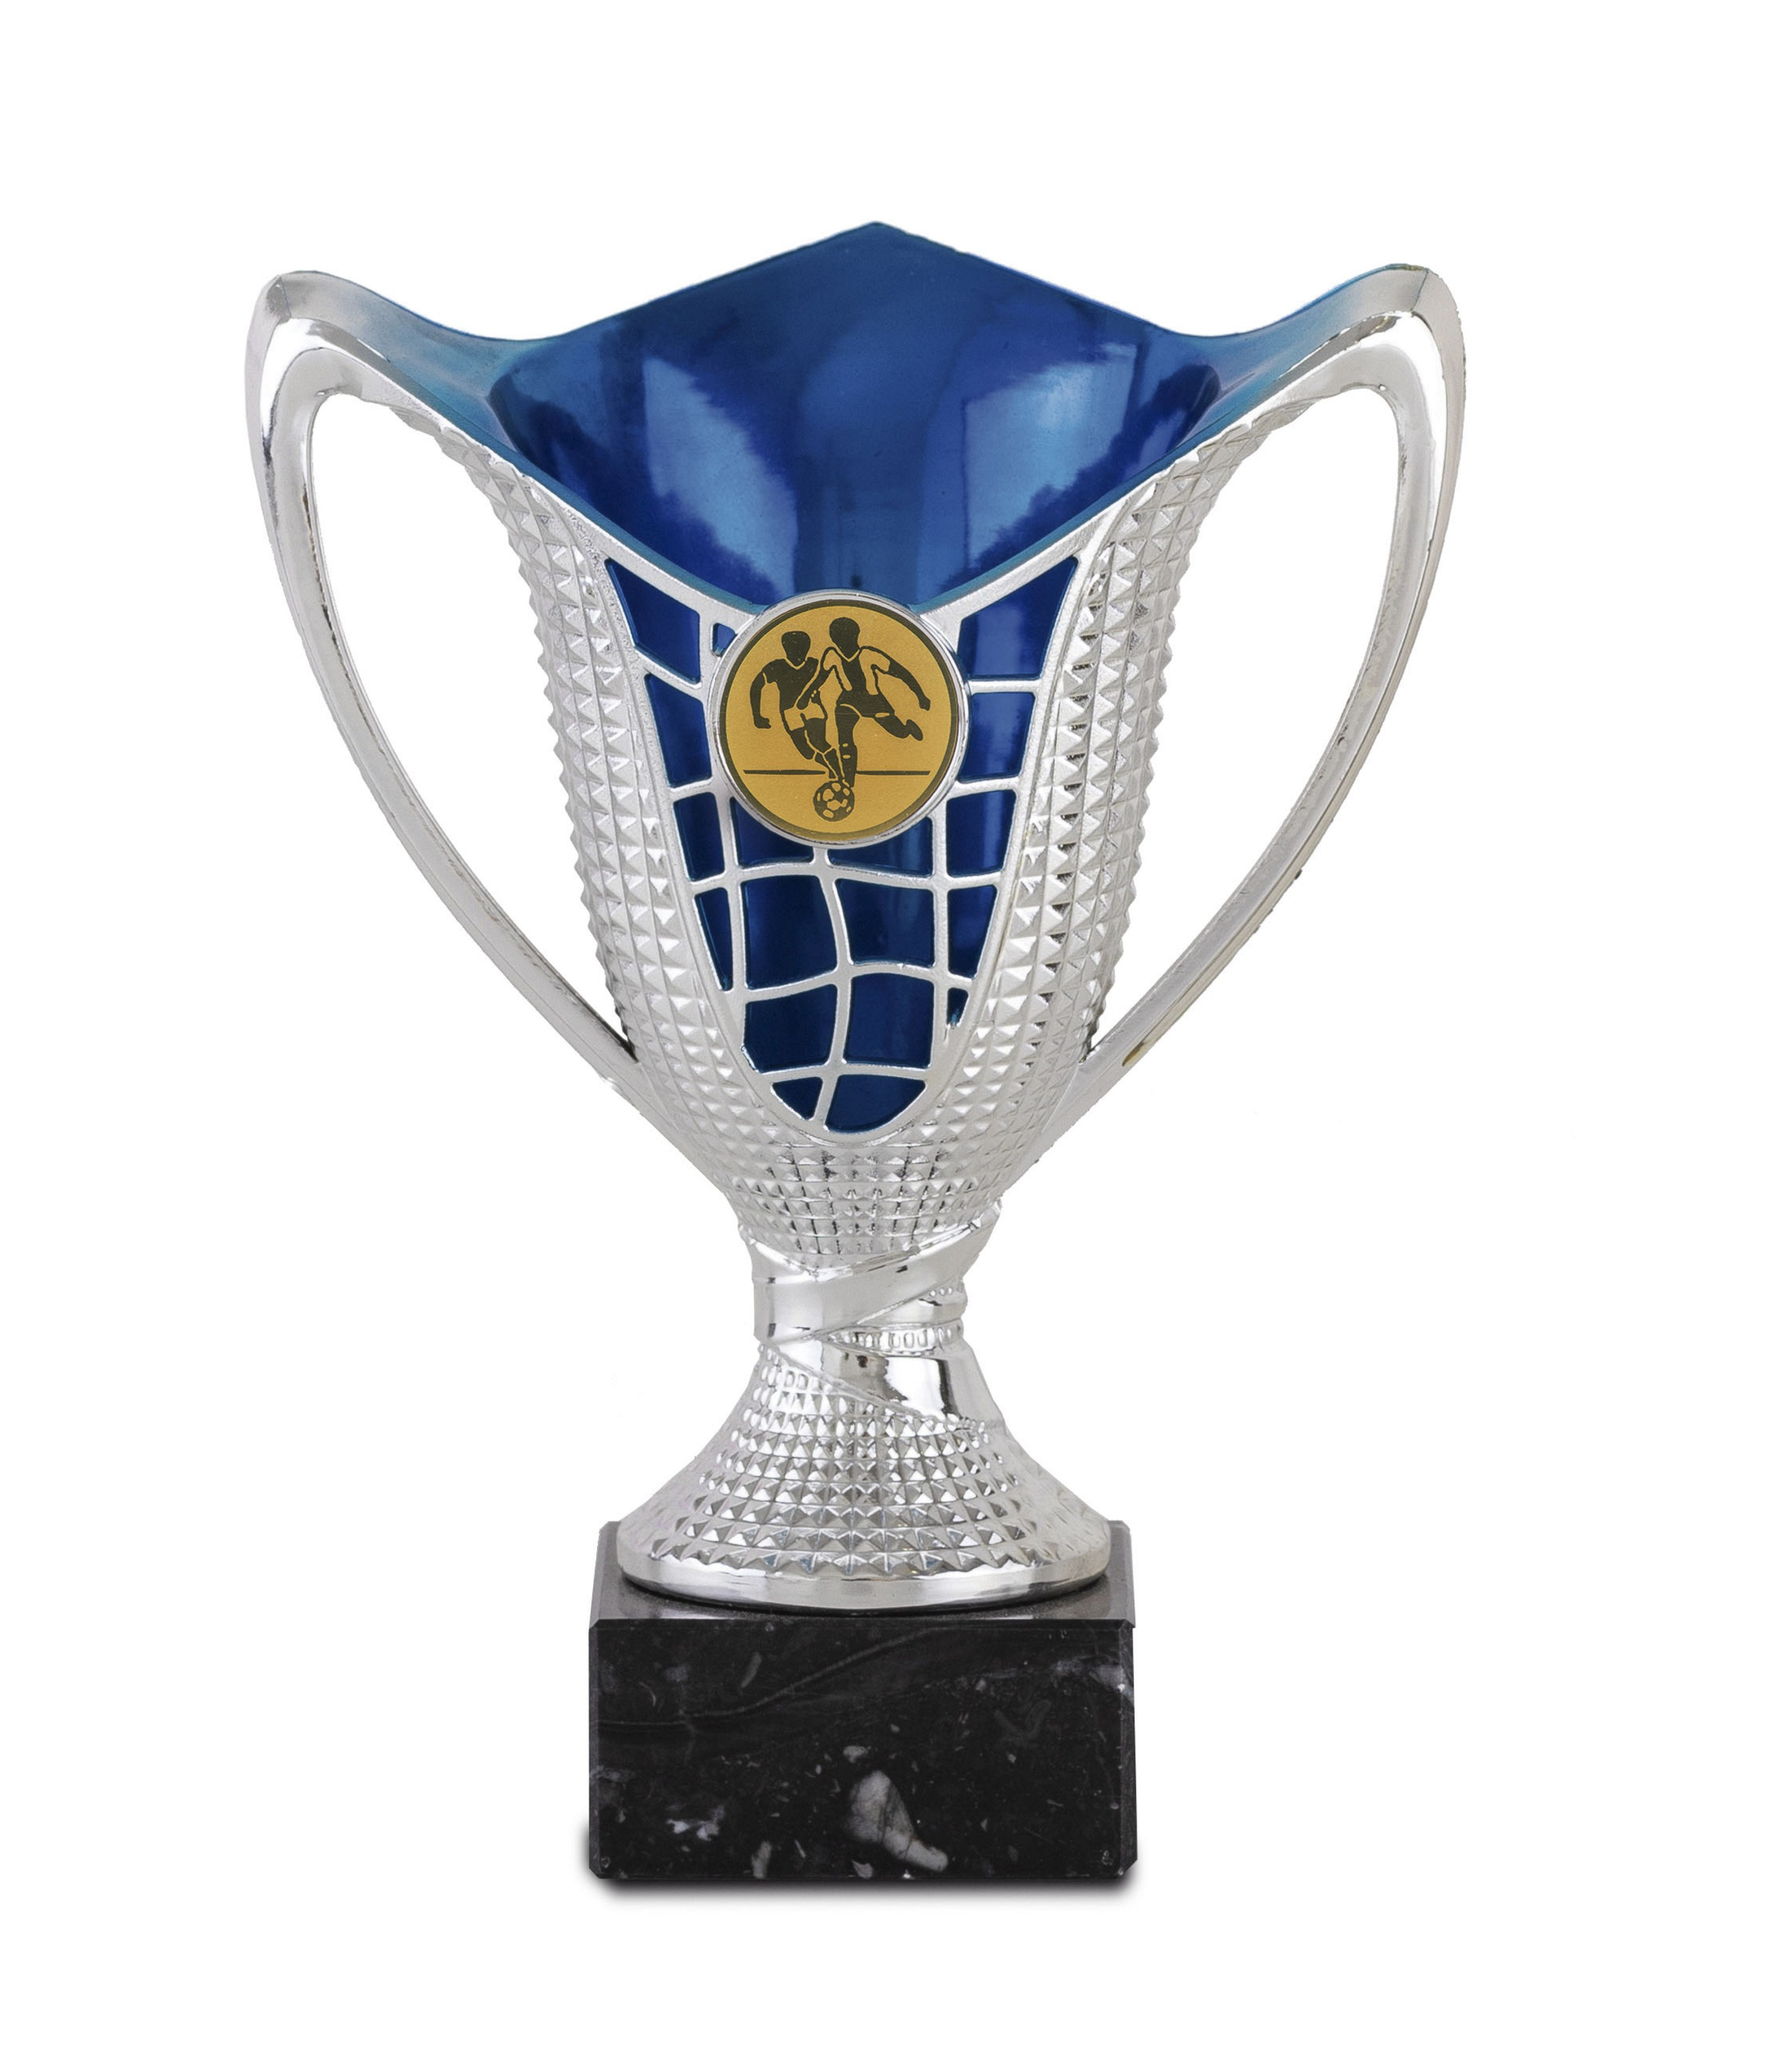 Copa en acrilico de color rojo o azul Plateado azul 17 cm 13,5 cm